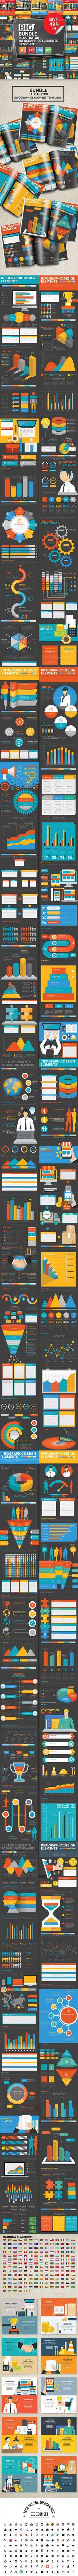 Bundle Infographic Set — Vector EPS #bar #display • Download ➝ https://graphicriver.net/item/bundle-infographic-set/19413630?ref=pxcr